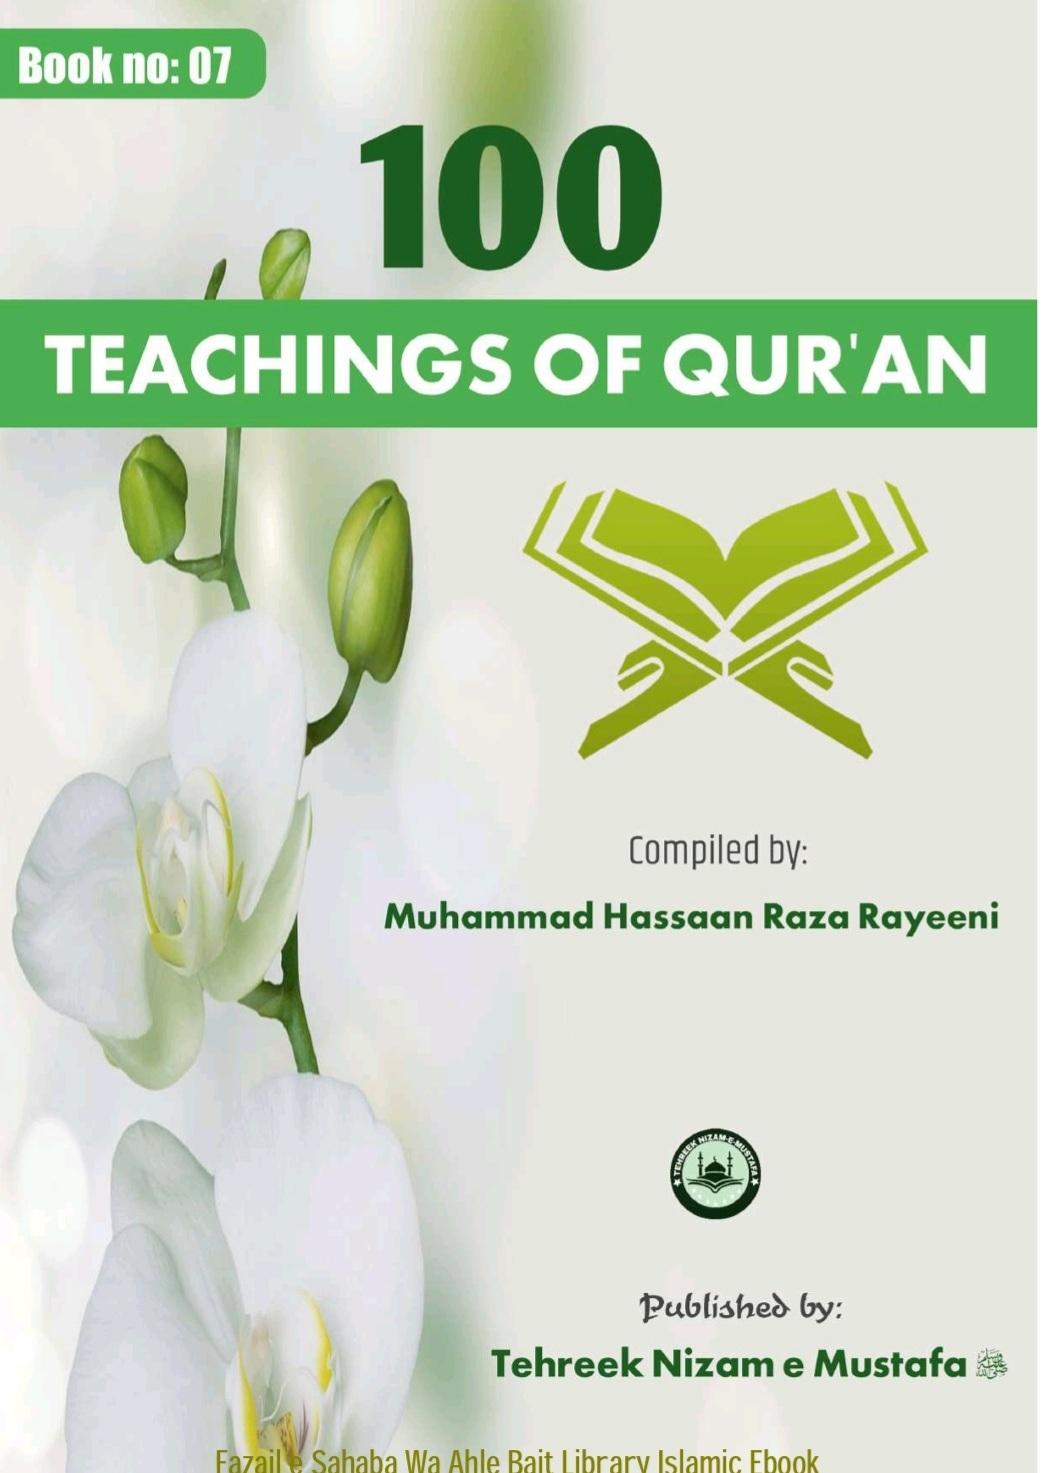 100 Teachings Of Qur'anby Muhammad Hassan Raza Reyeeni100